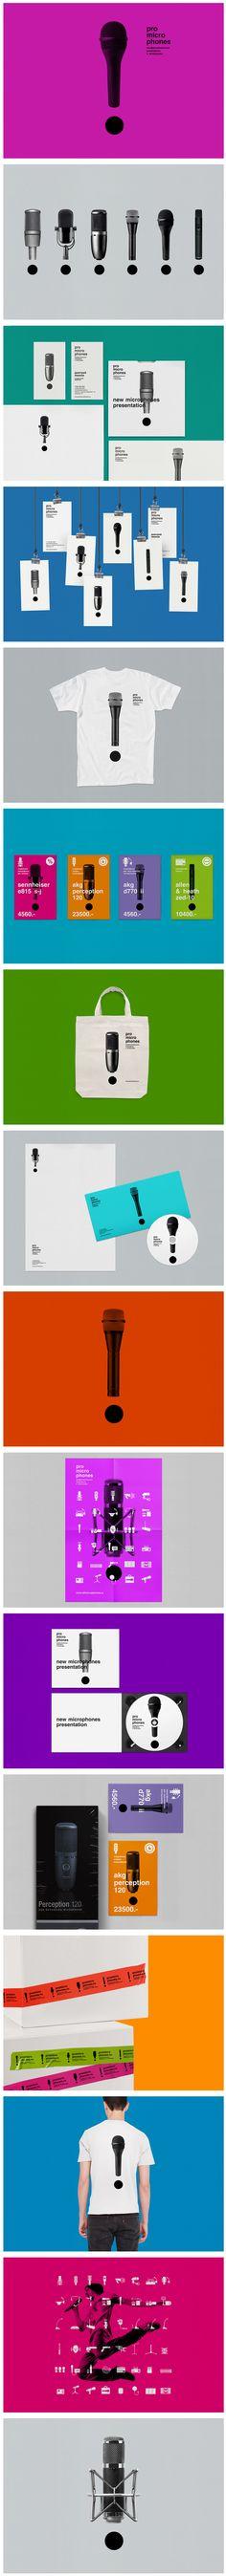 Microphones by Vova Lifanov